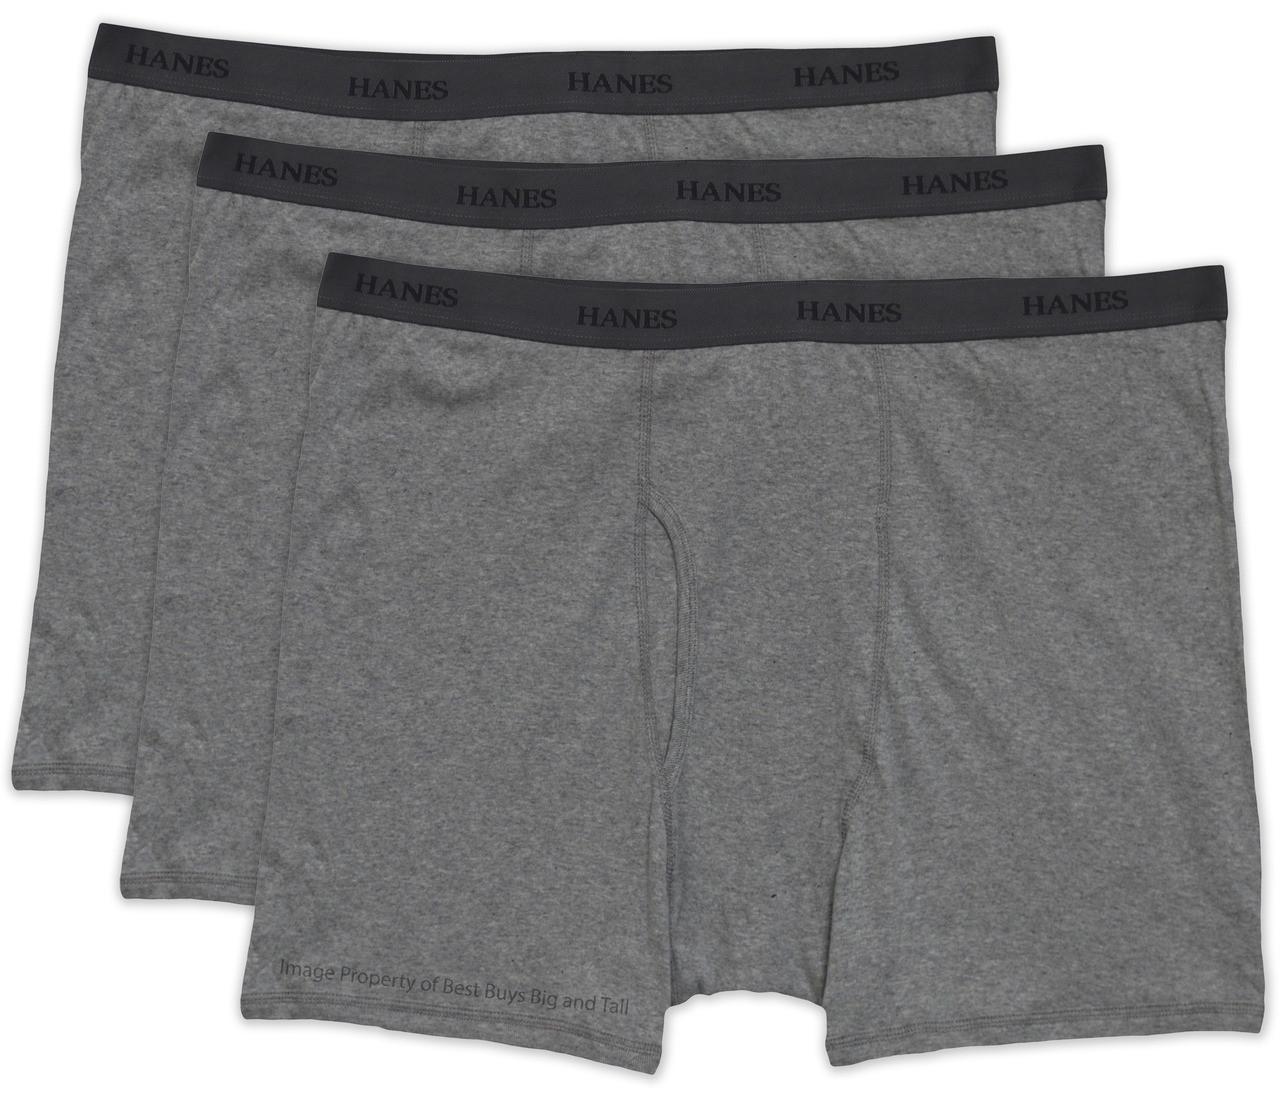 c76462d6e9d8 SHOP NOW! Big & Tall Men's Gray Underwear Boxer Briefs 3-Pack by Hanes